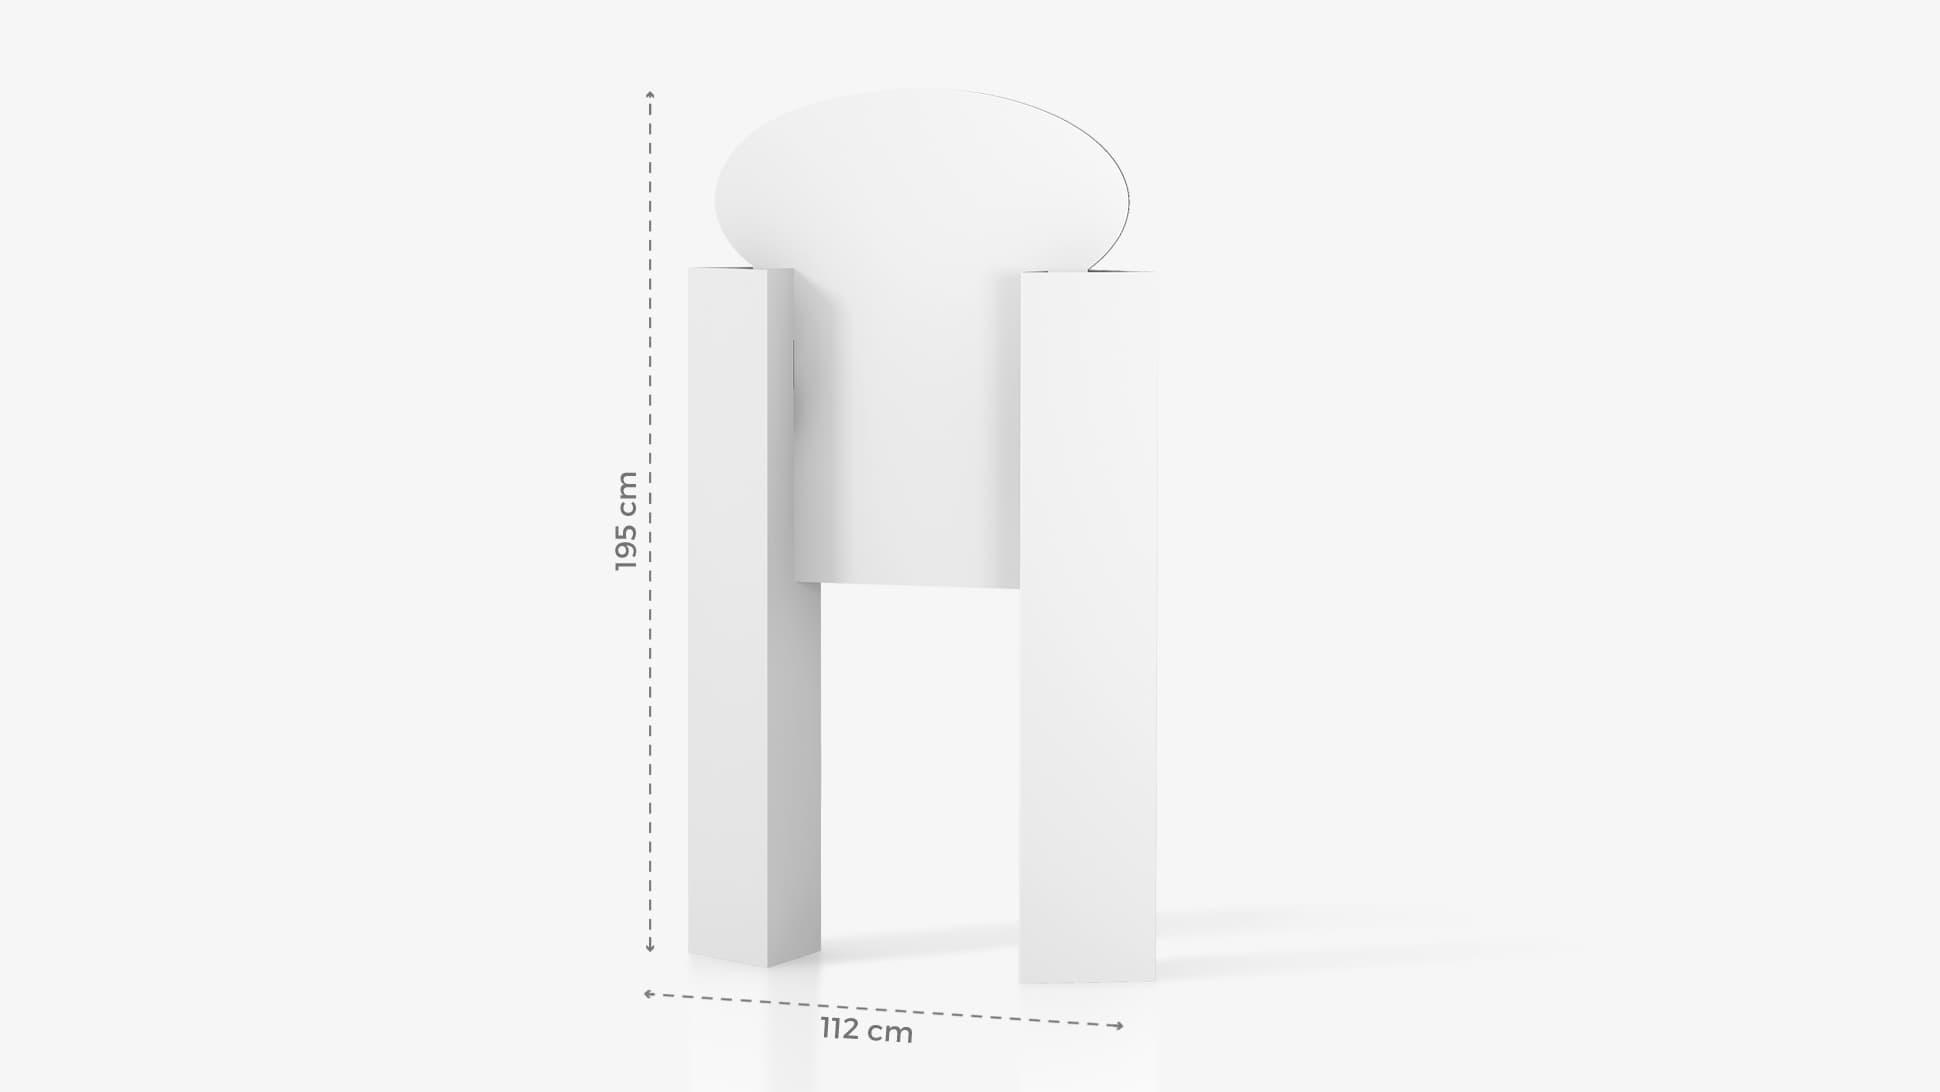 Display insegna h195 cm personalizzabile | tictac.it